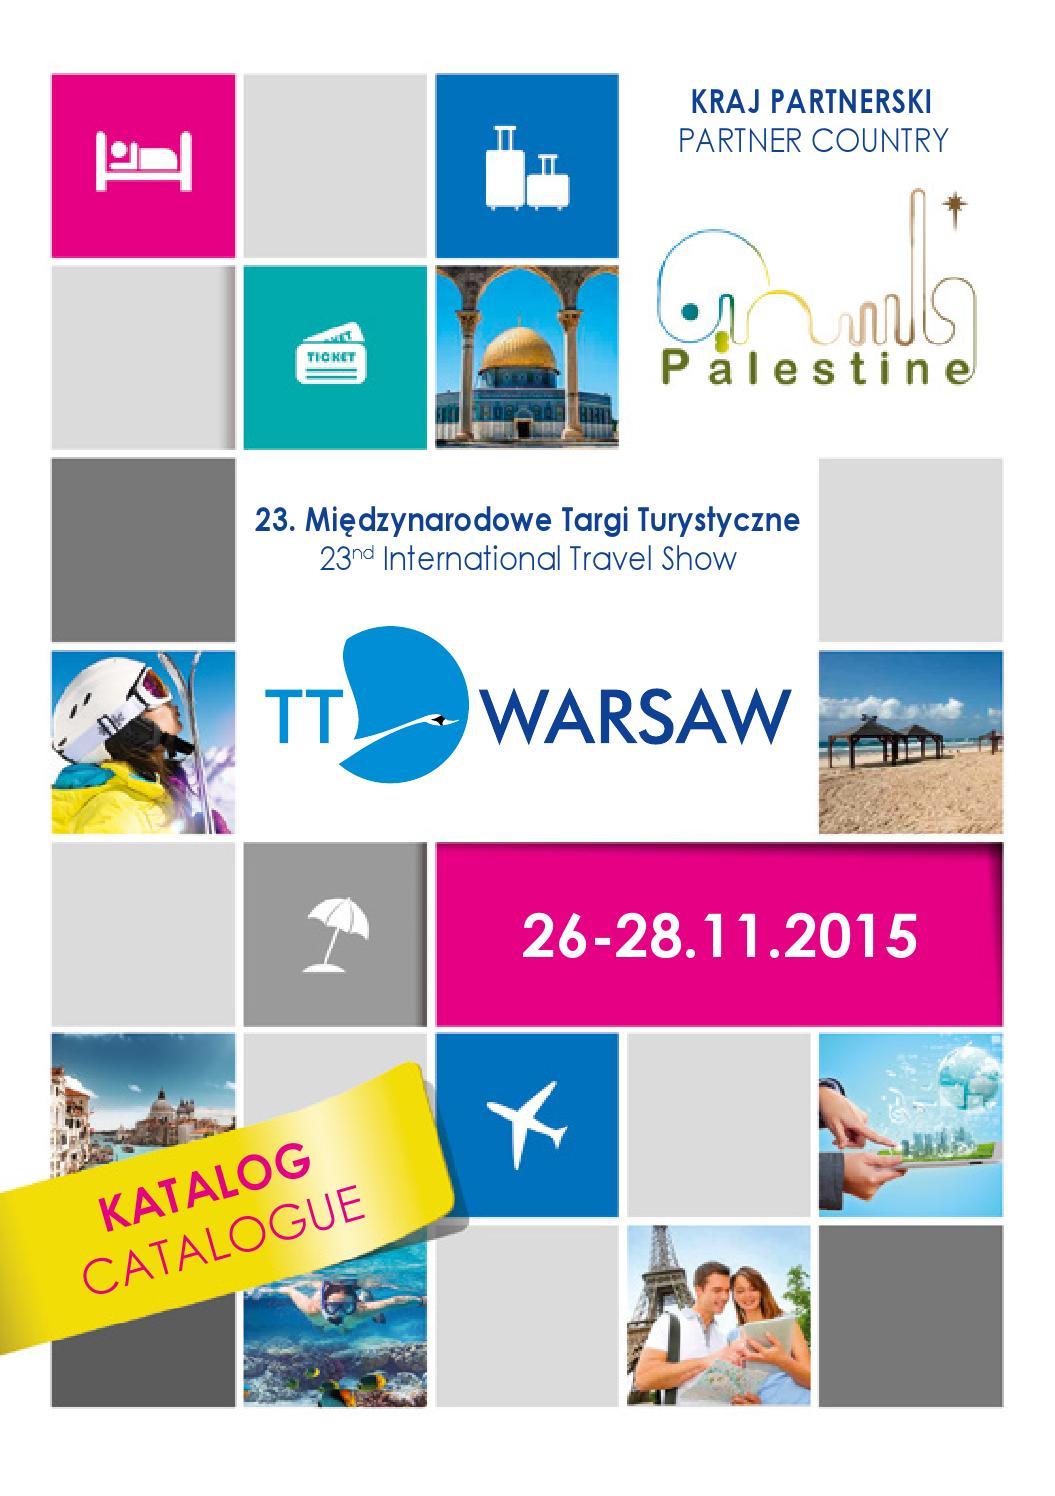 tt warsaw 2015 katalog by mt targi polska sa issuu. Black Bedroom Furniture Sets. Home Design Ideas